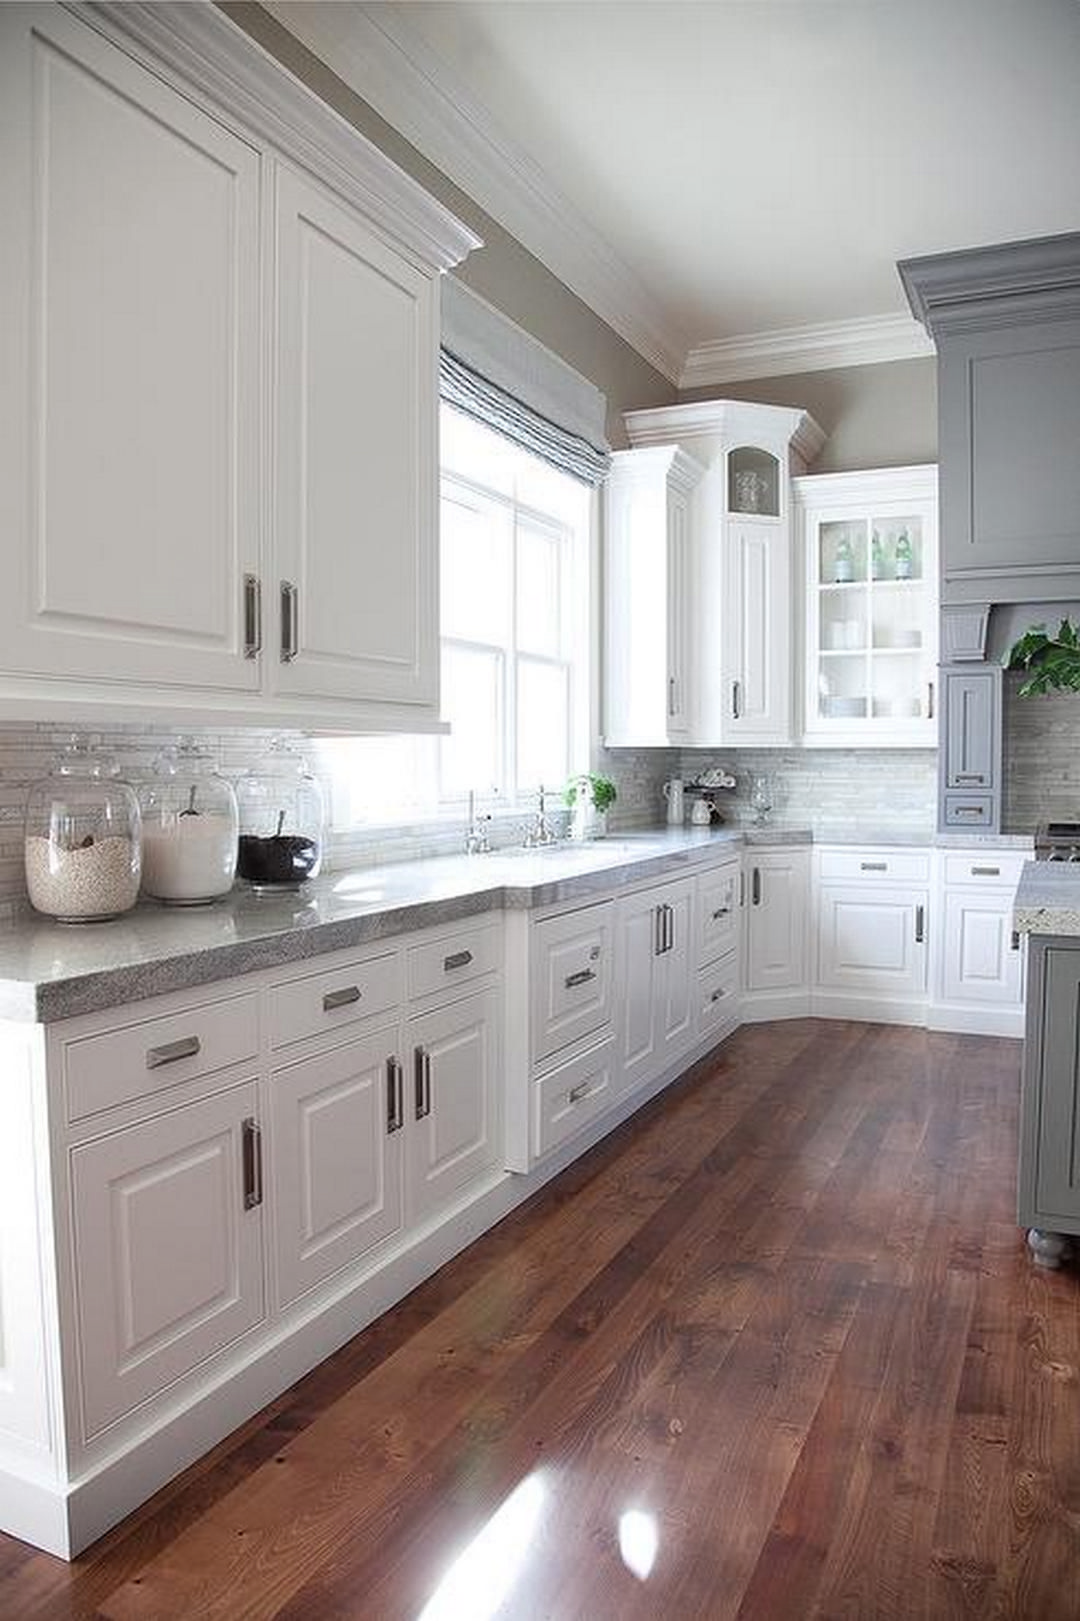 Best Kitchen Gallery: 53 Pretty White Kitchen Design Ideas Kitchen Design Kitchens And of Pictures Of Kitchens With White Cabinets on rachelxblog.com